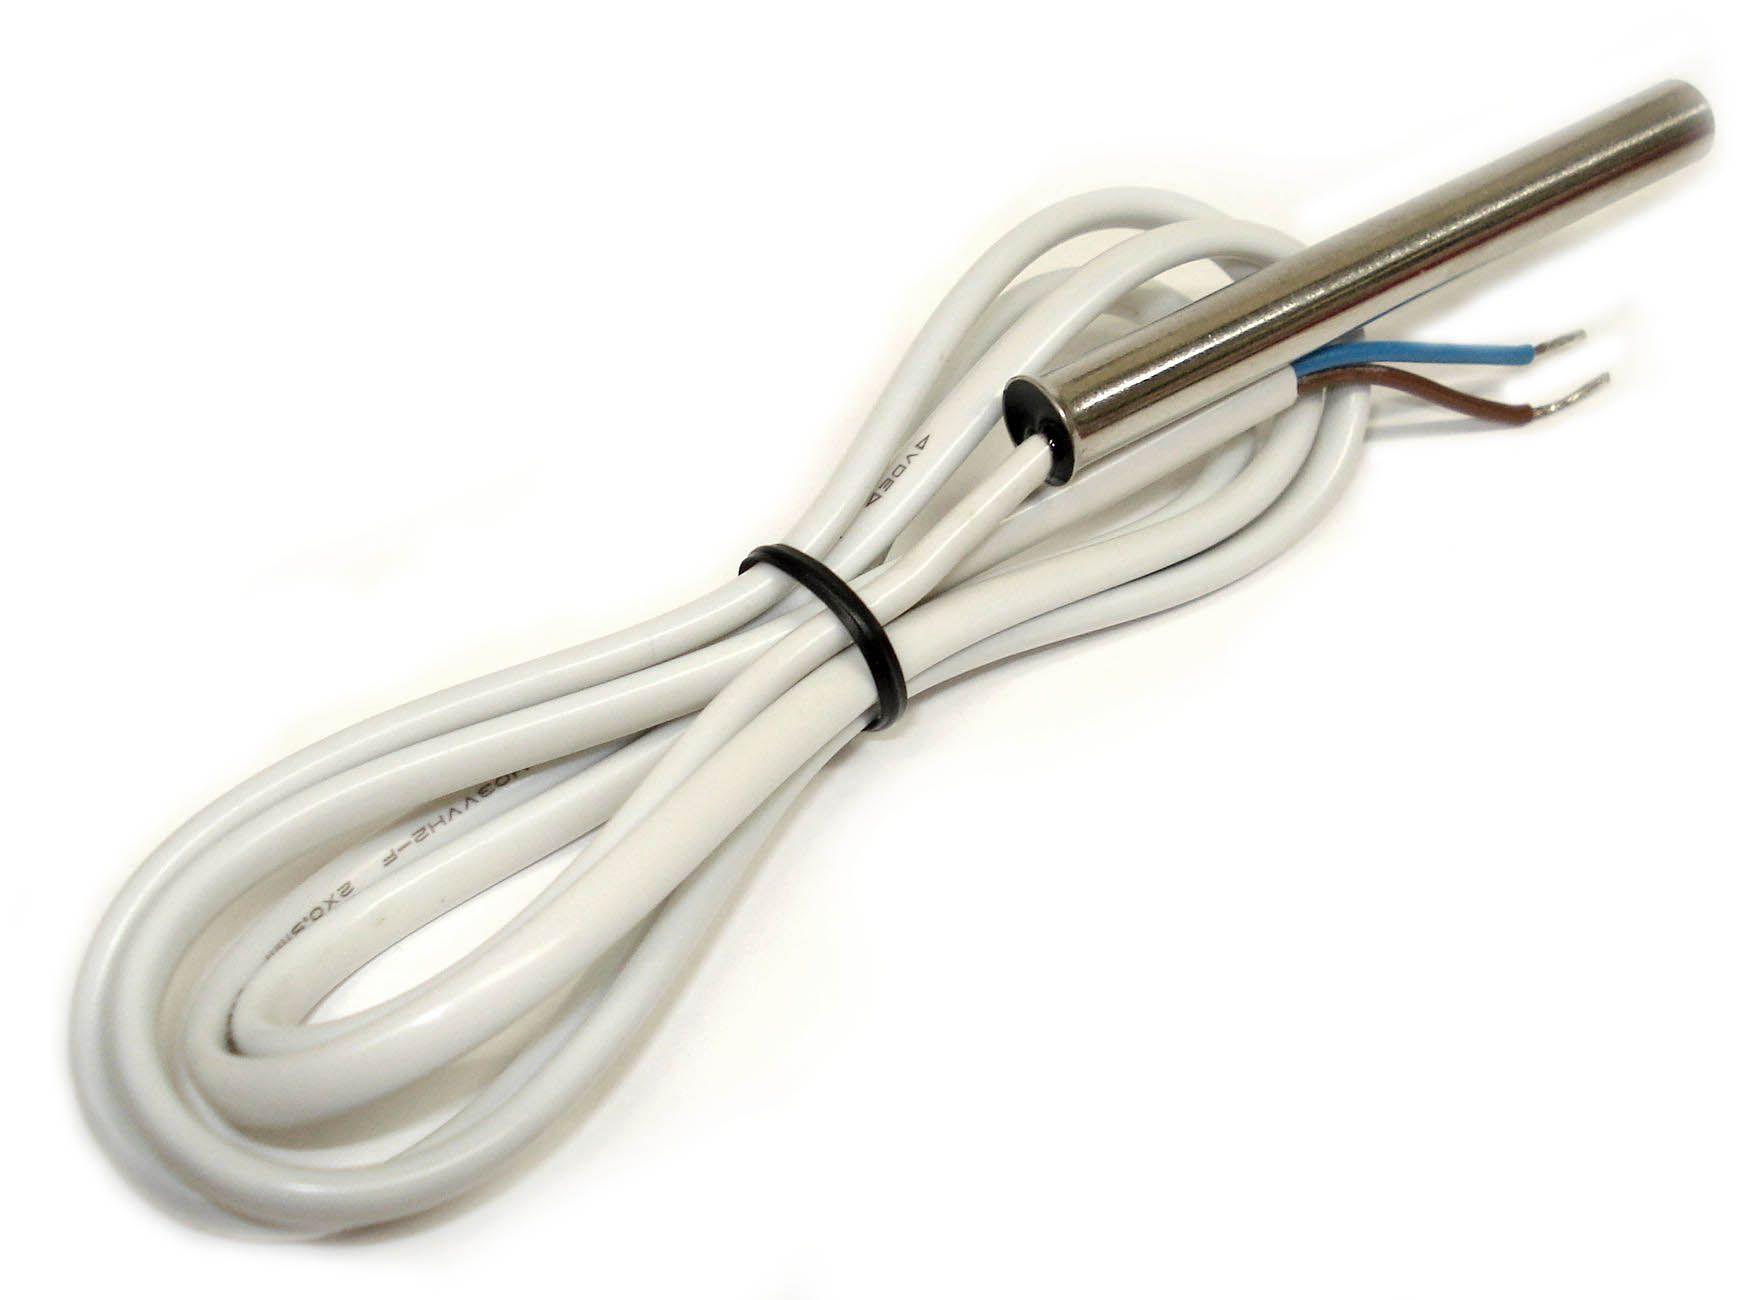 1-Wire temperature sensors